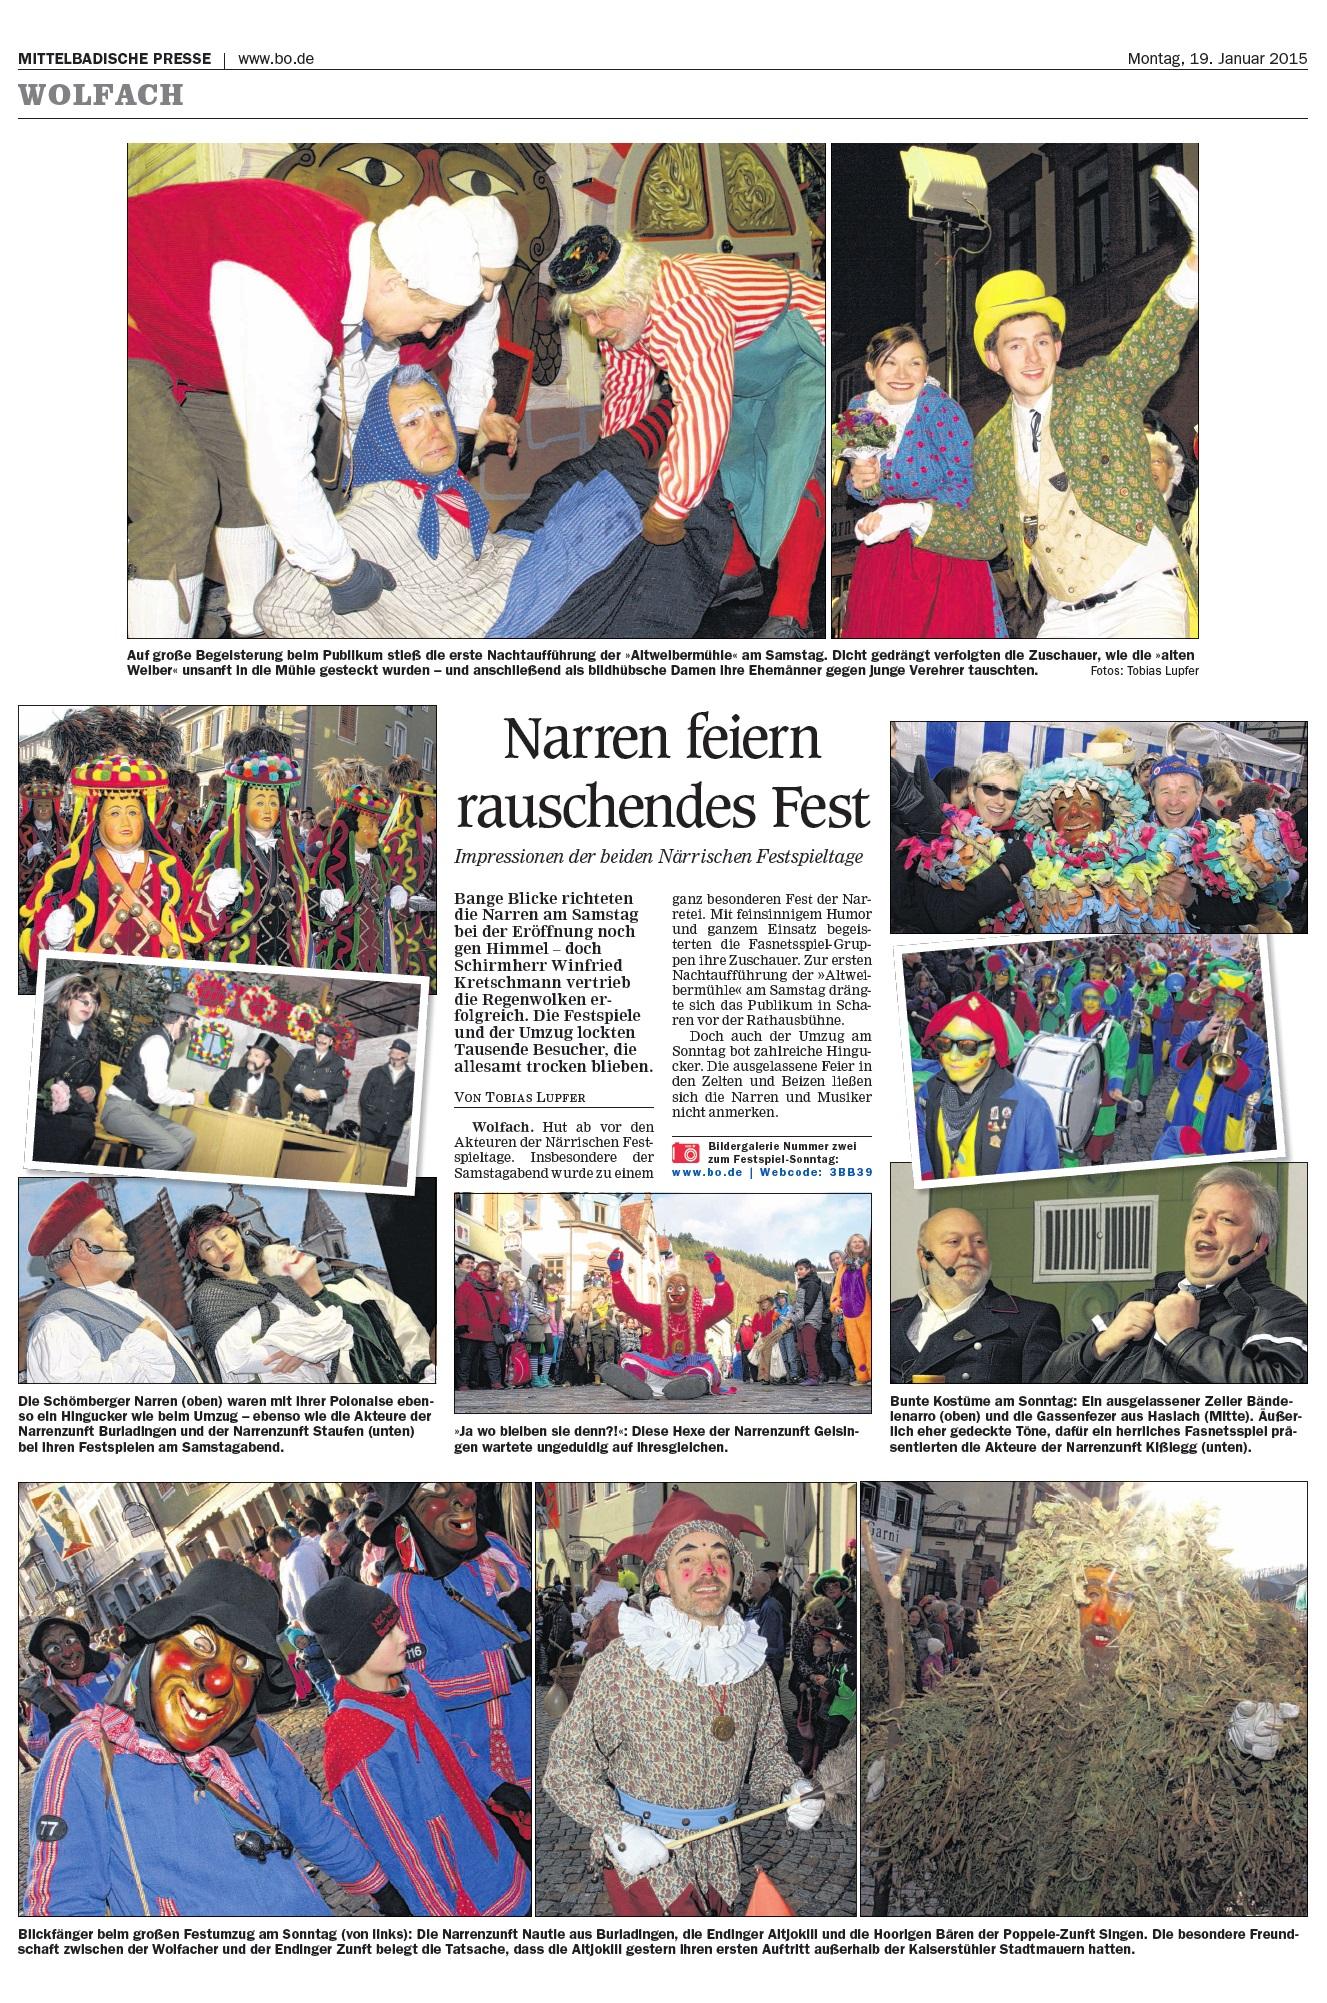 Offenburger Tageblatt (2015-01-19b_OT)